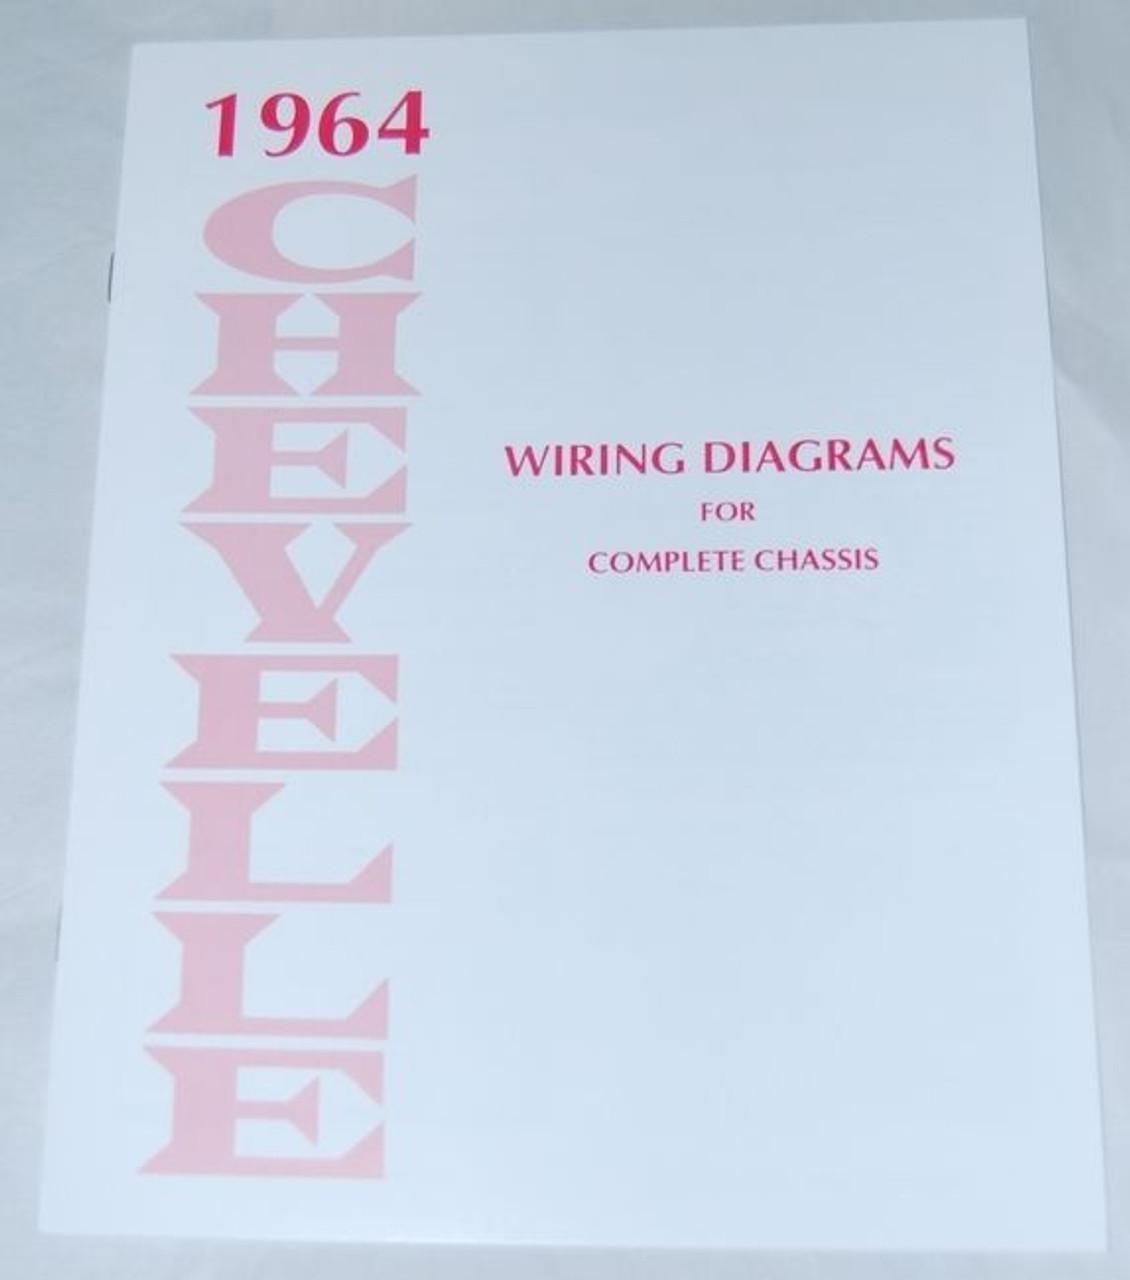 64 chevelle wiring diagram 64 cj5 wiring diagram 64 1964 chevelle el camino electrical wiring diagram ... #14